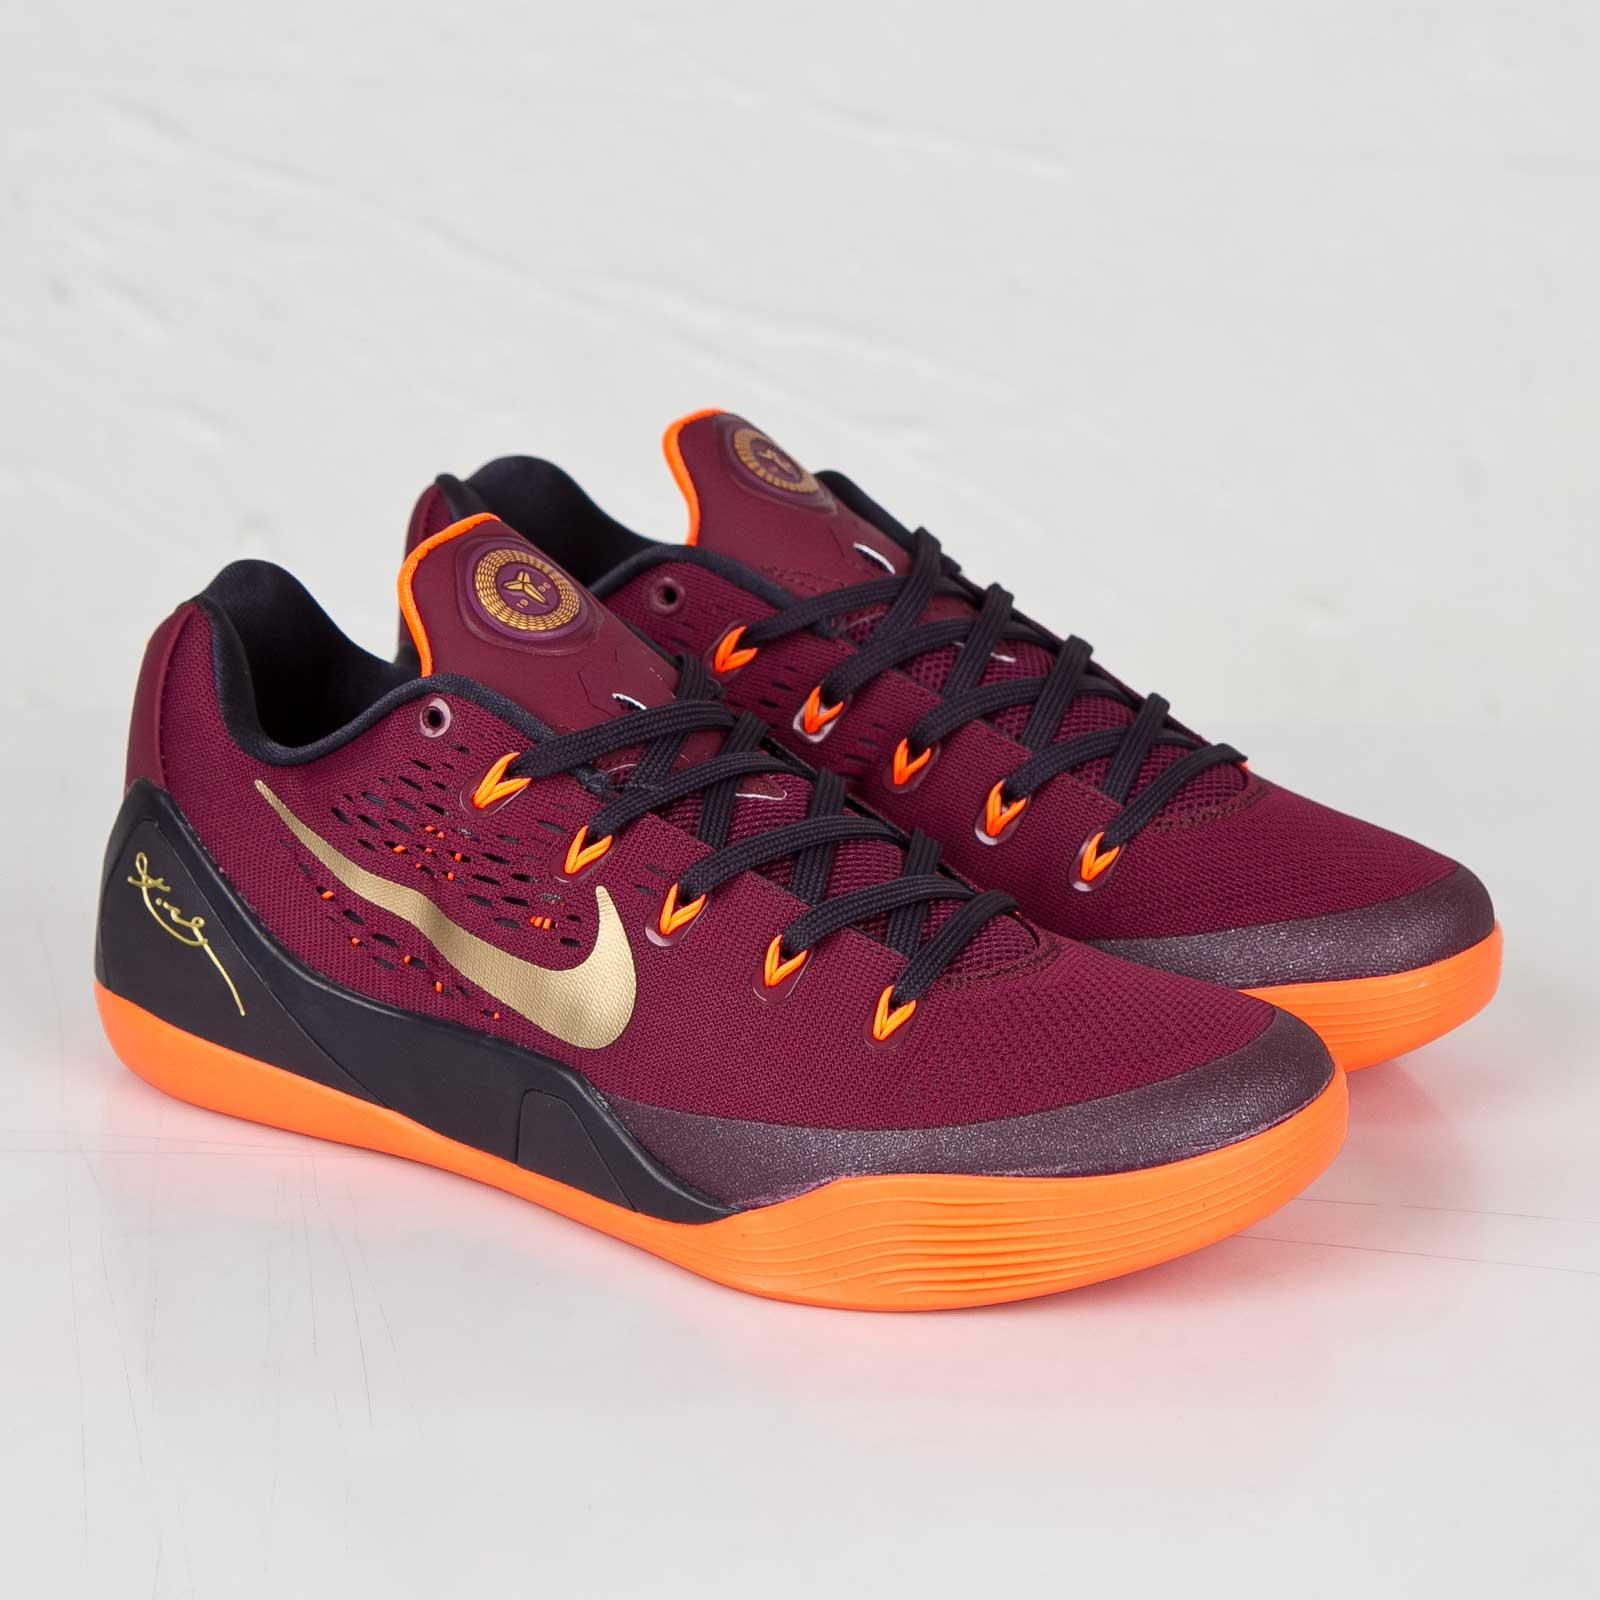 huge selection of 7cb16 d4620 Nike Kobe IX - 646701-678 - Sneakersnstuff   sneakers   streetwear ...